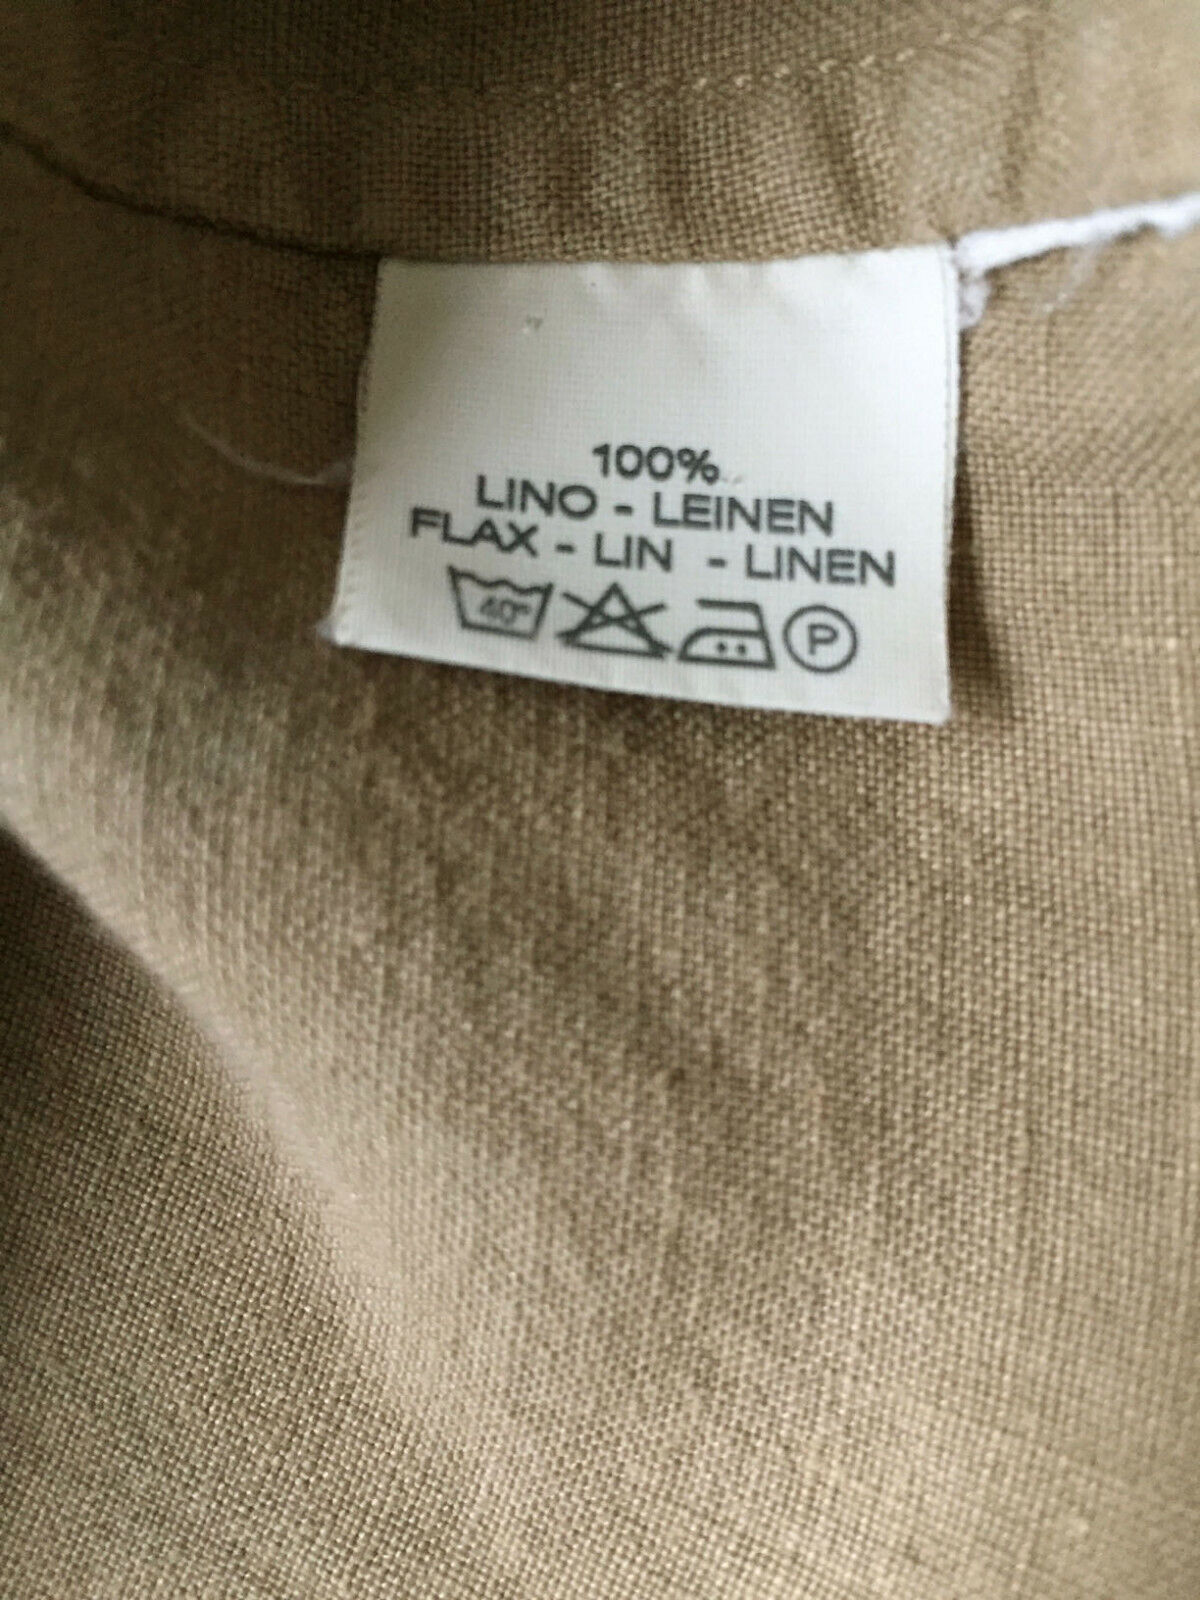 ETRO Womens Sz 44 / US 8 Tan Linen Jacket French … - image 5